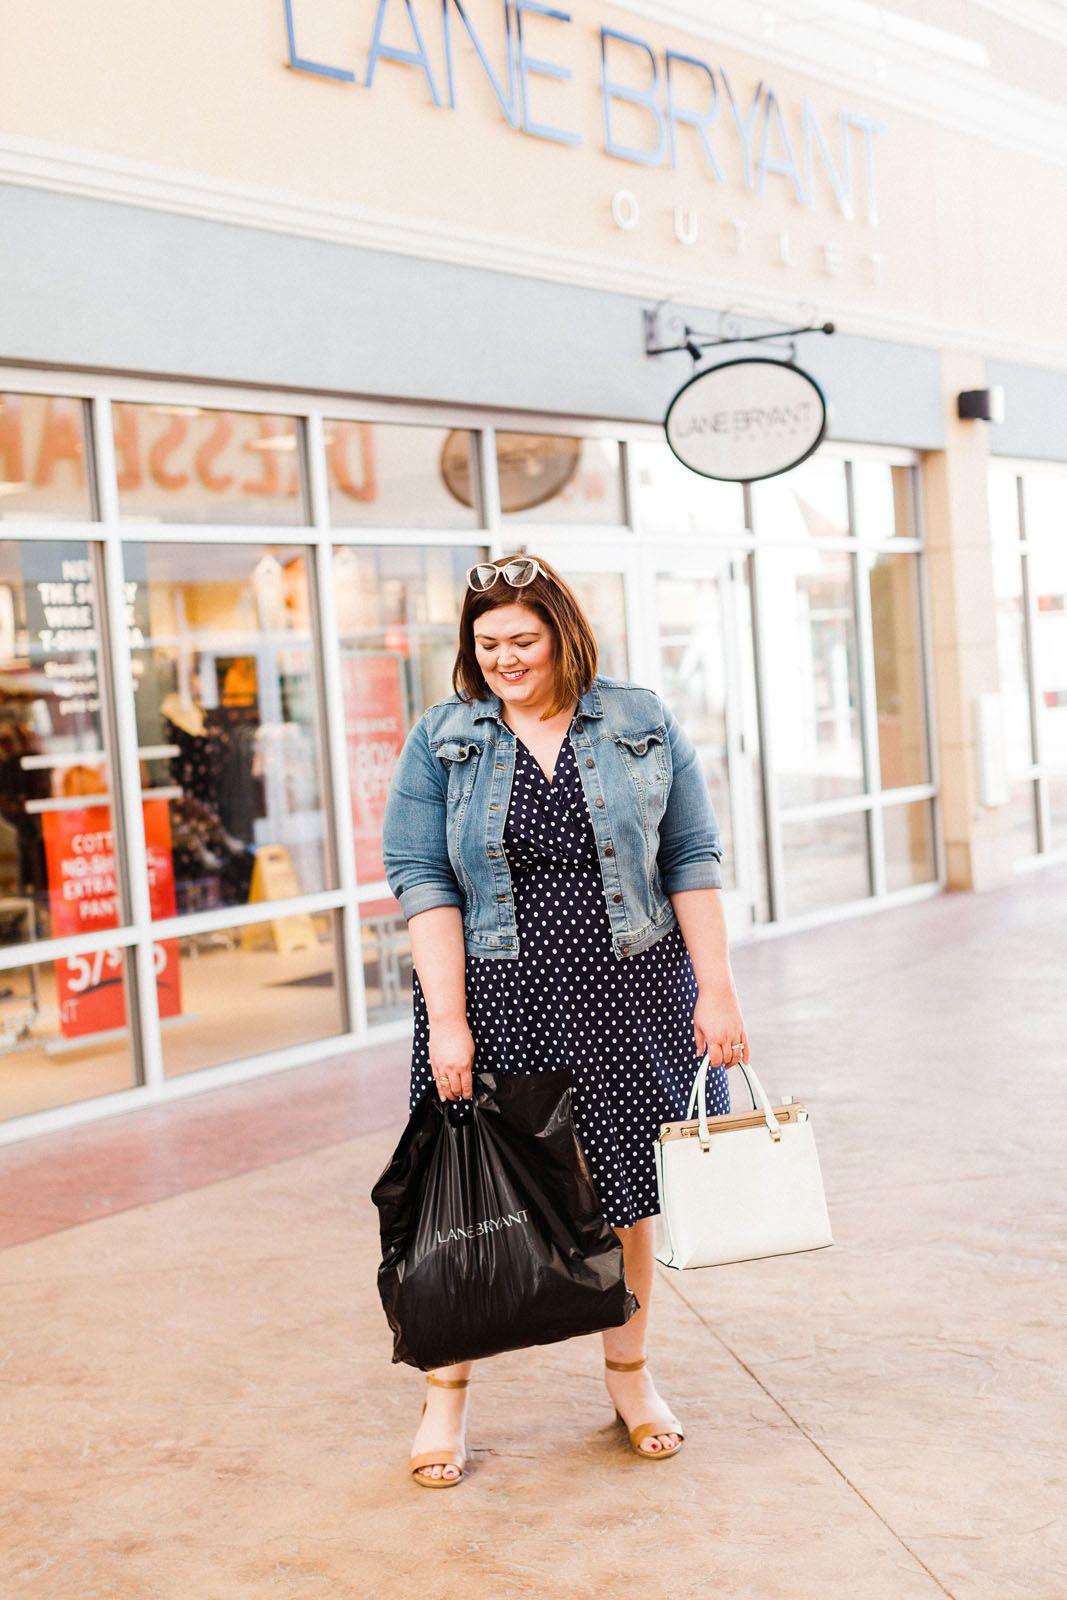 Designer Outlet Shopping near Louisville Plus size